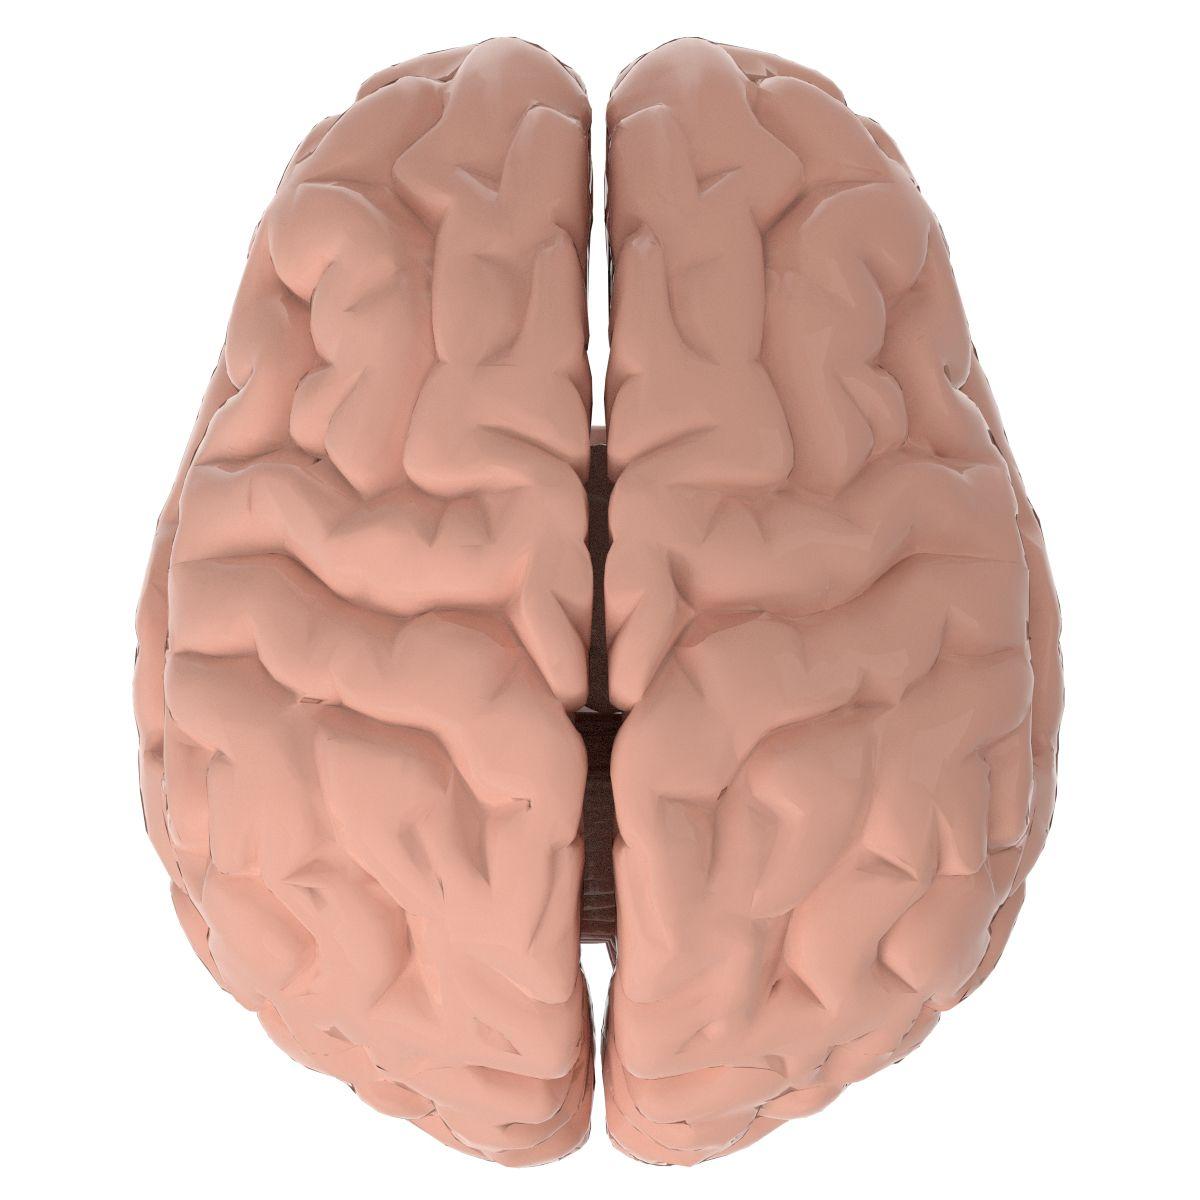 3D Model Anatomy - Human Brain (PBR, UV-unwrapped) | Anatomy ...